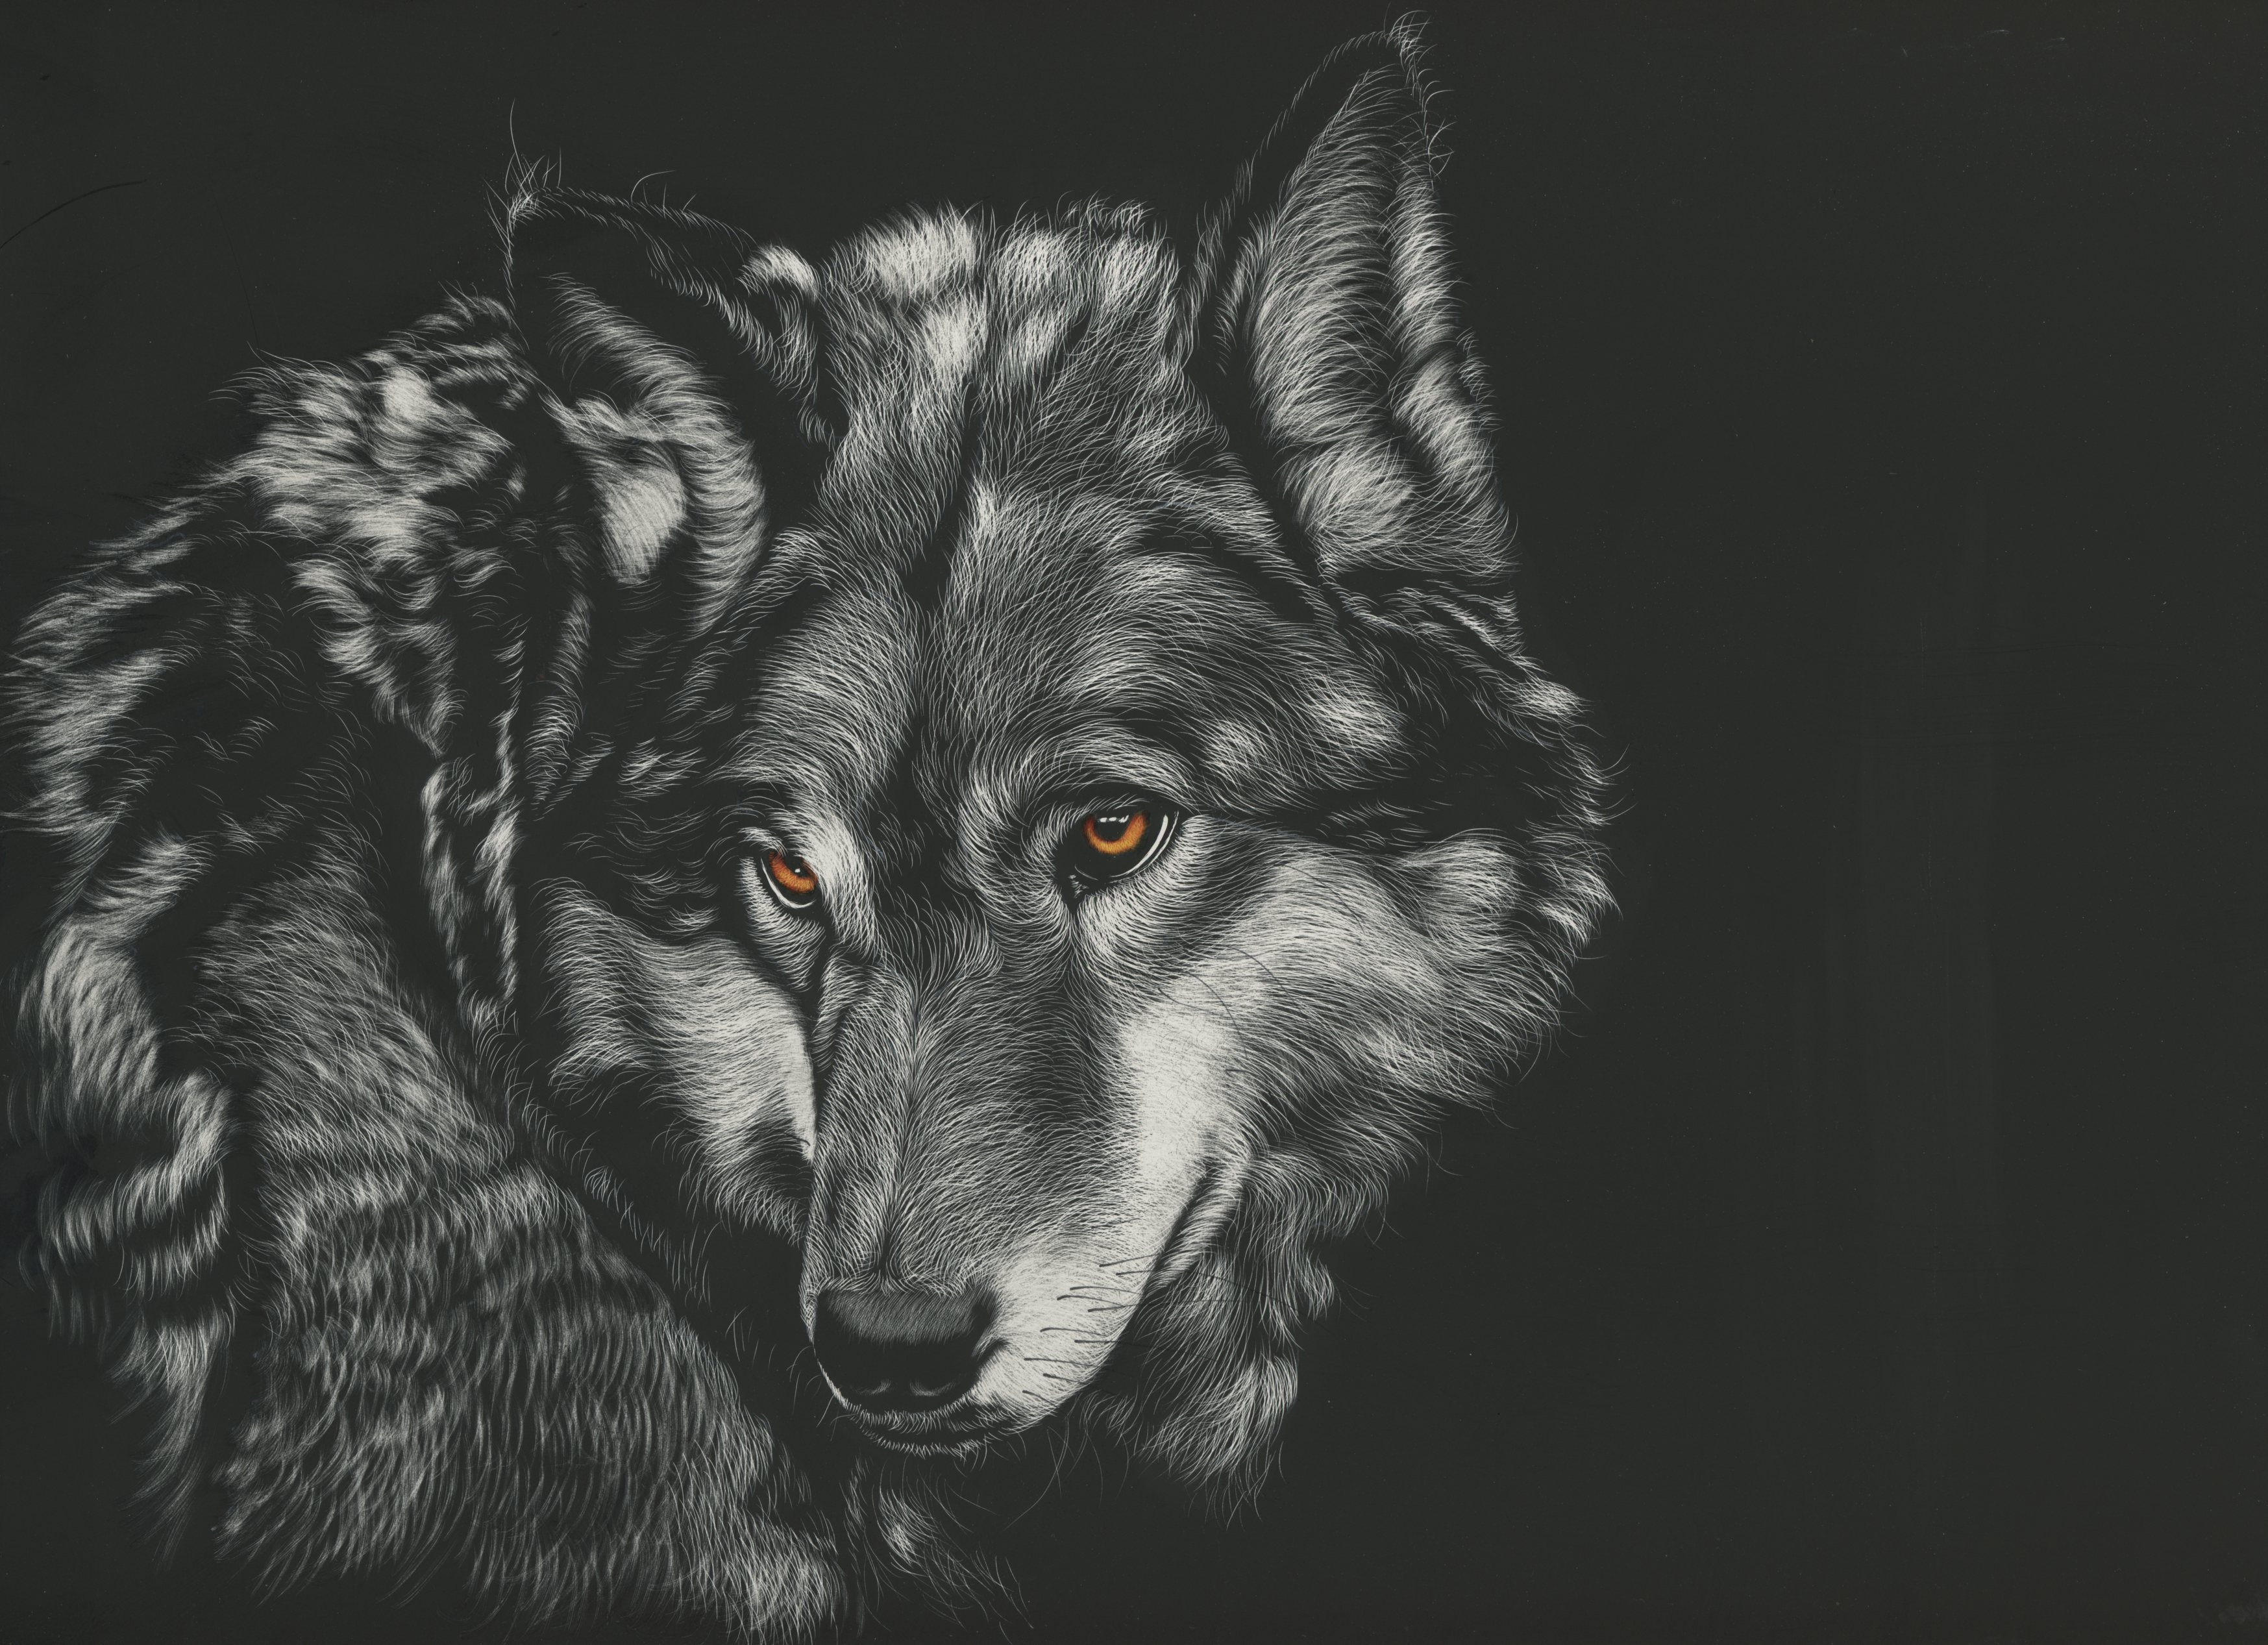 Good Wallpaper Macbook Wolf - wolf-painting-4k-s9  Trends_402979.jpg